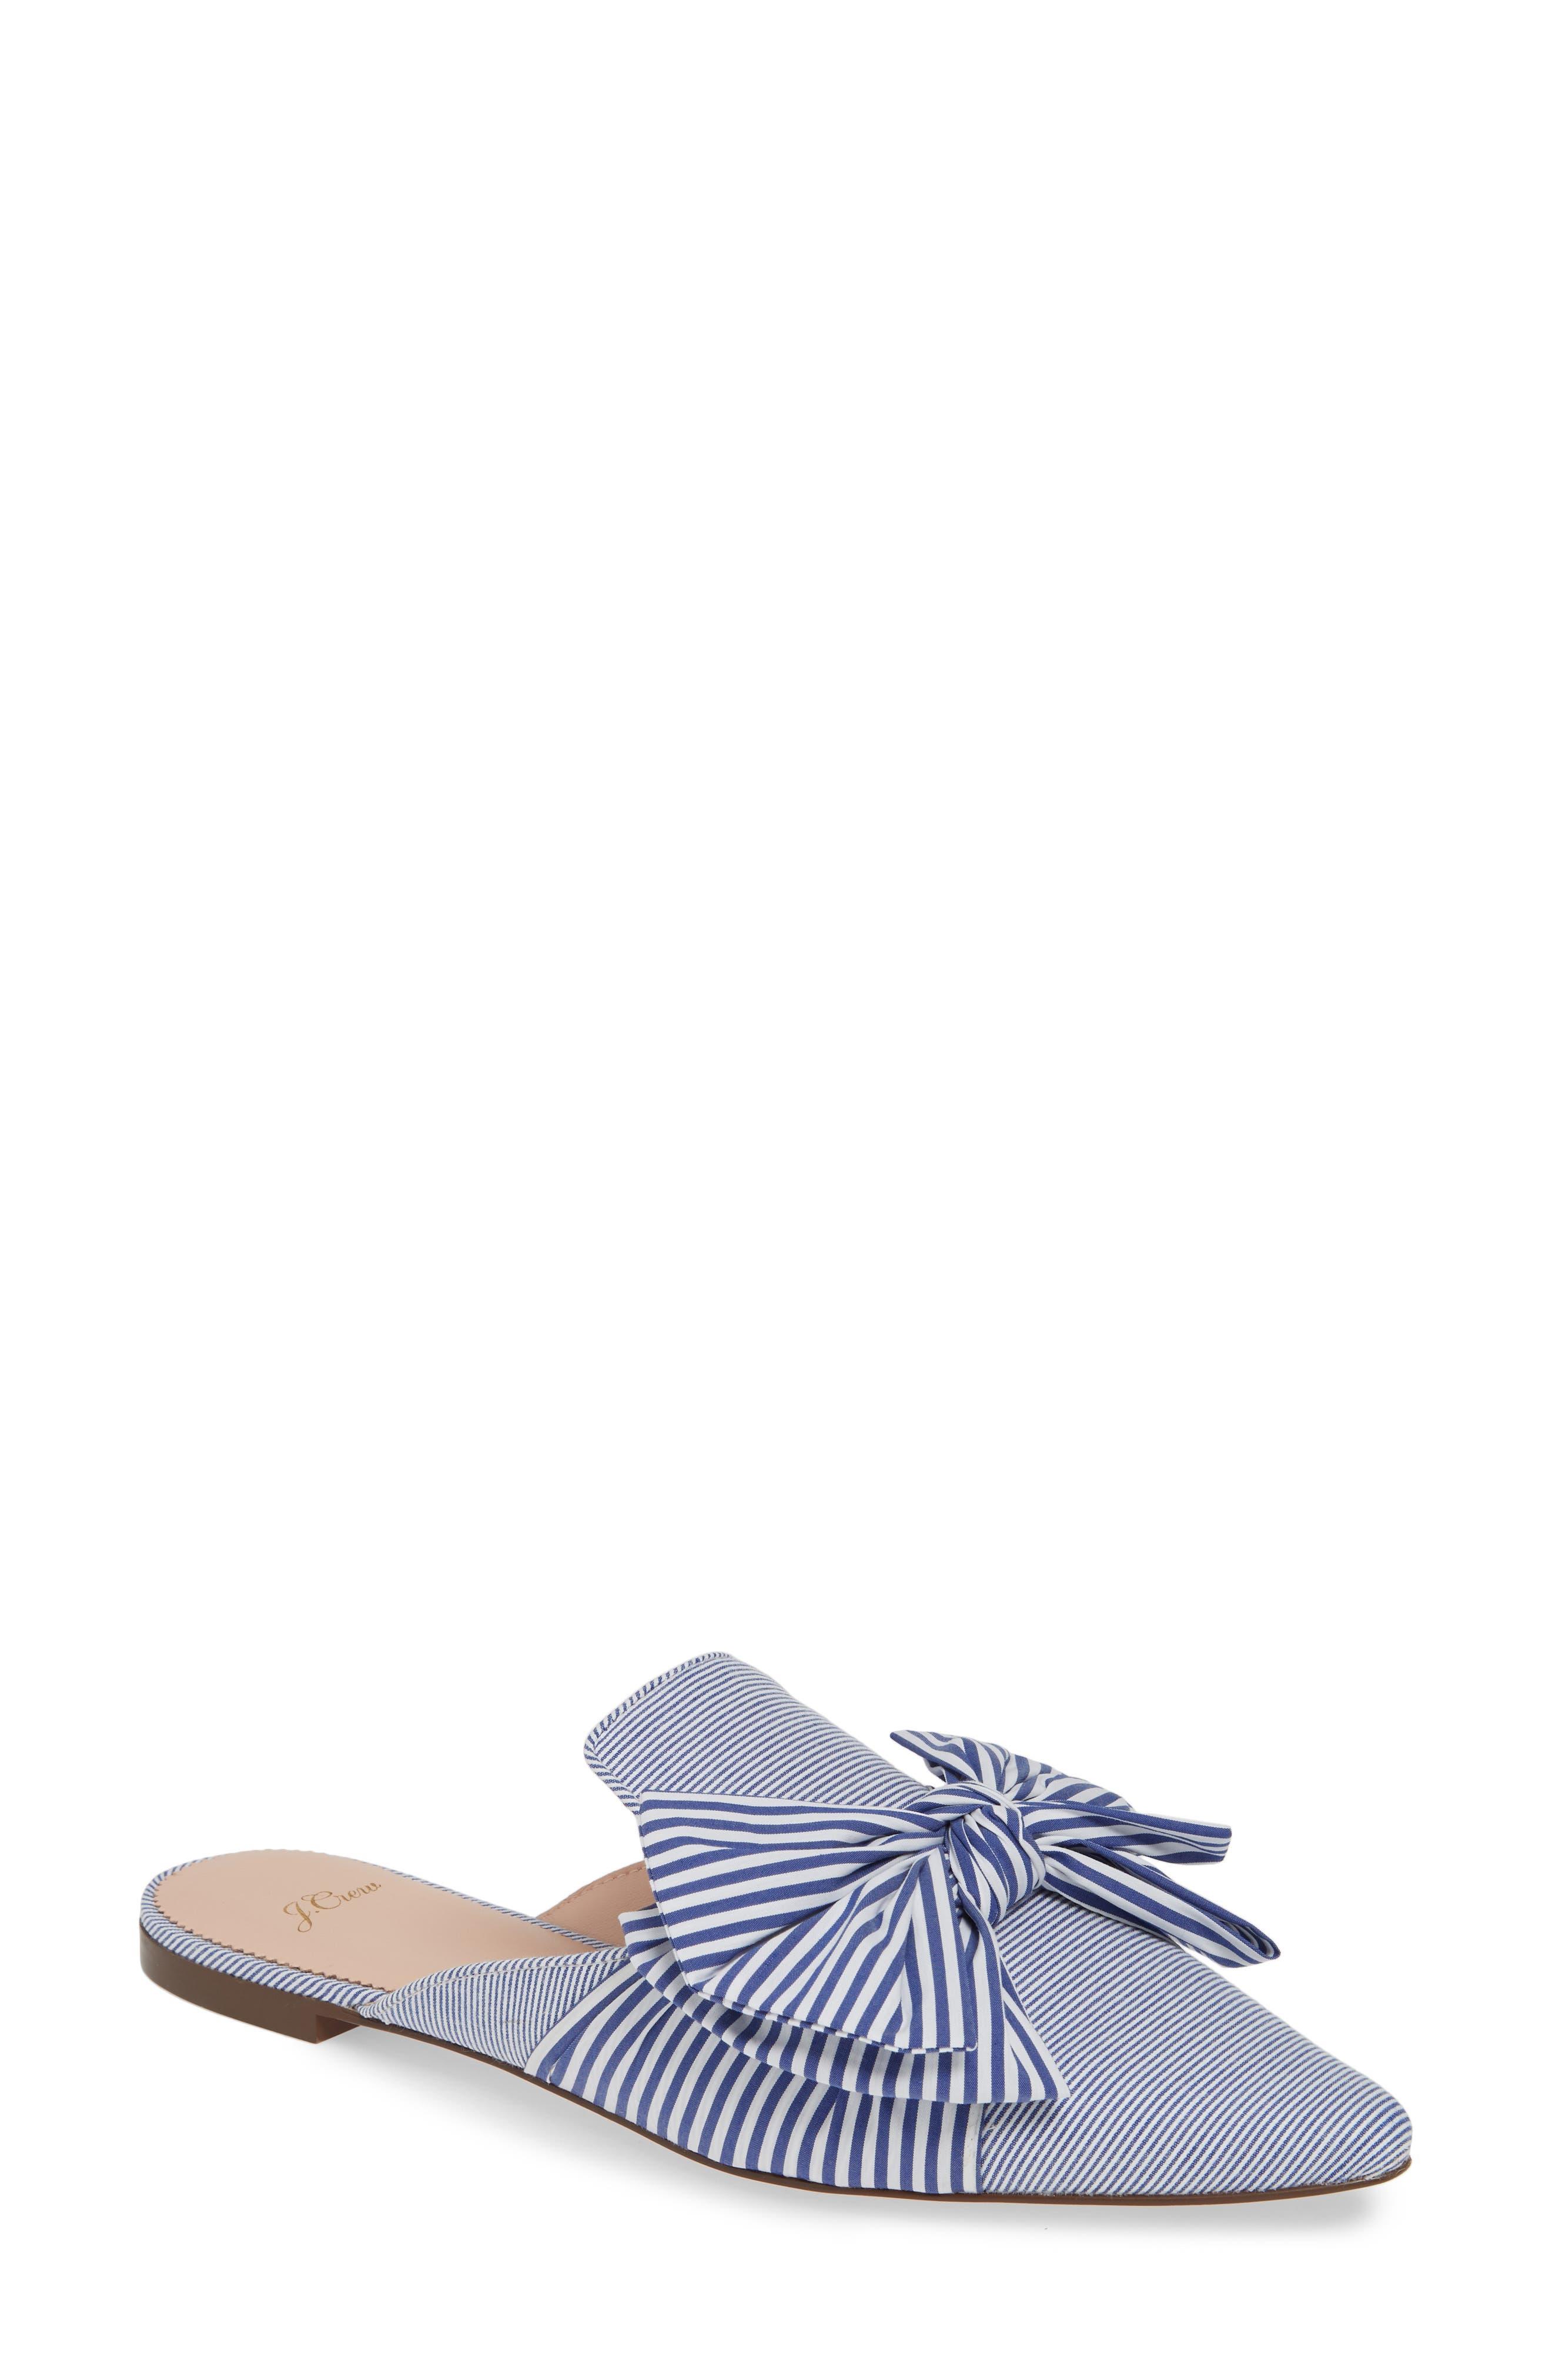 J.CREW Pointed Toe Mule, Main, color, OCEAN WHITE